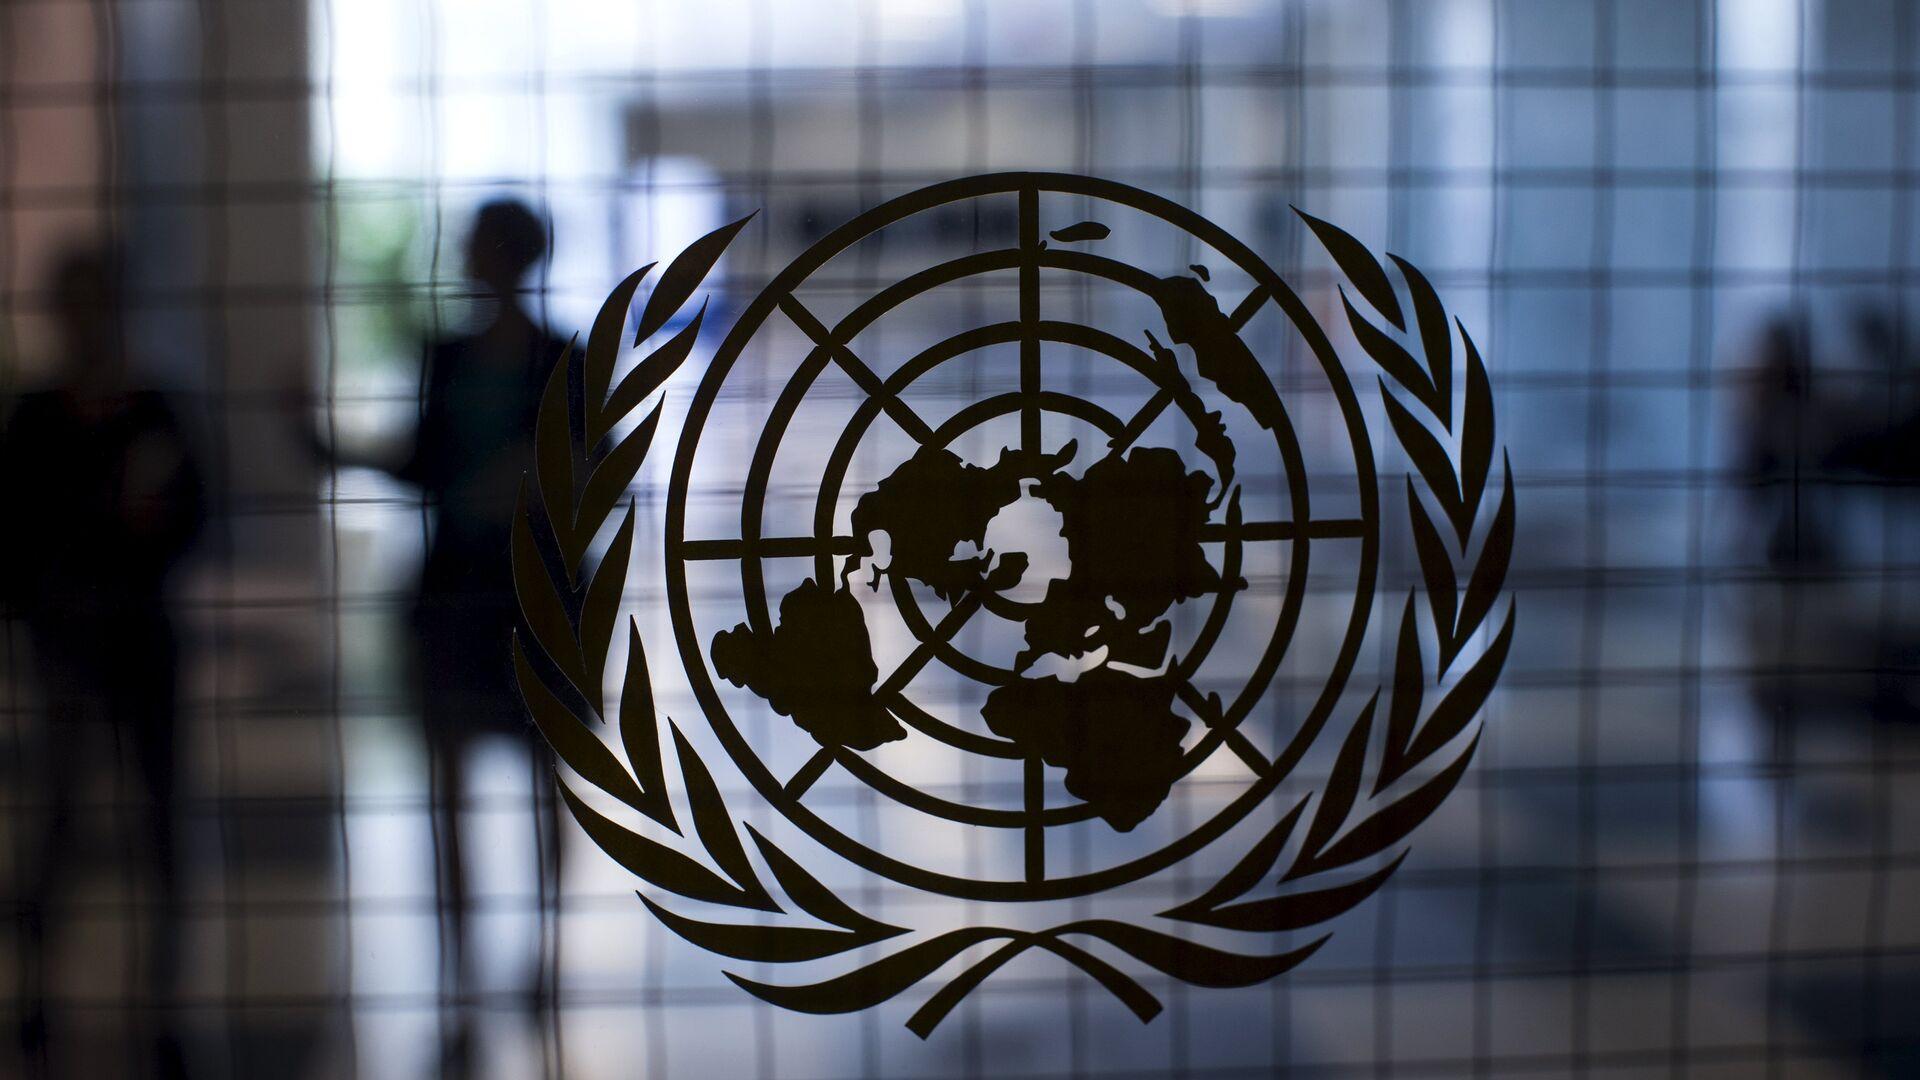 Logo de la ONU - Sputnik Mundo, 1920, 03.02.2021